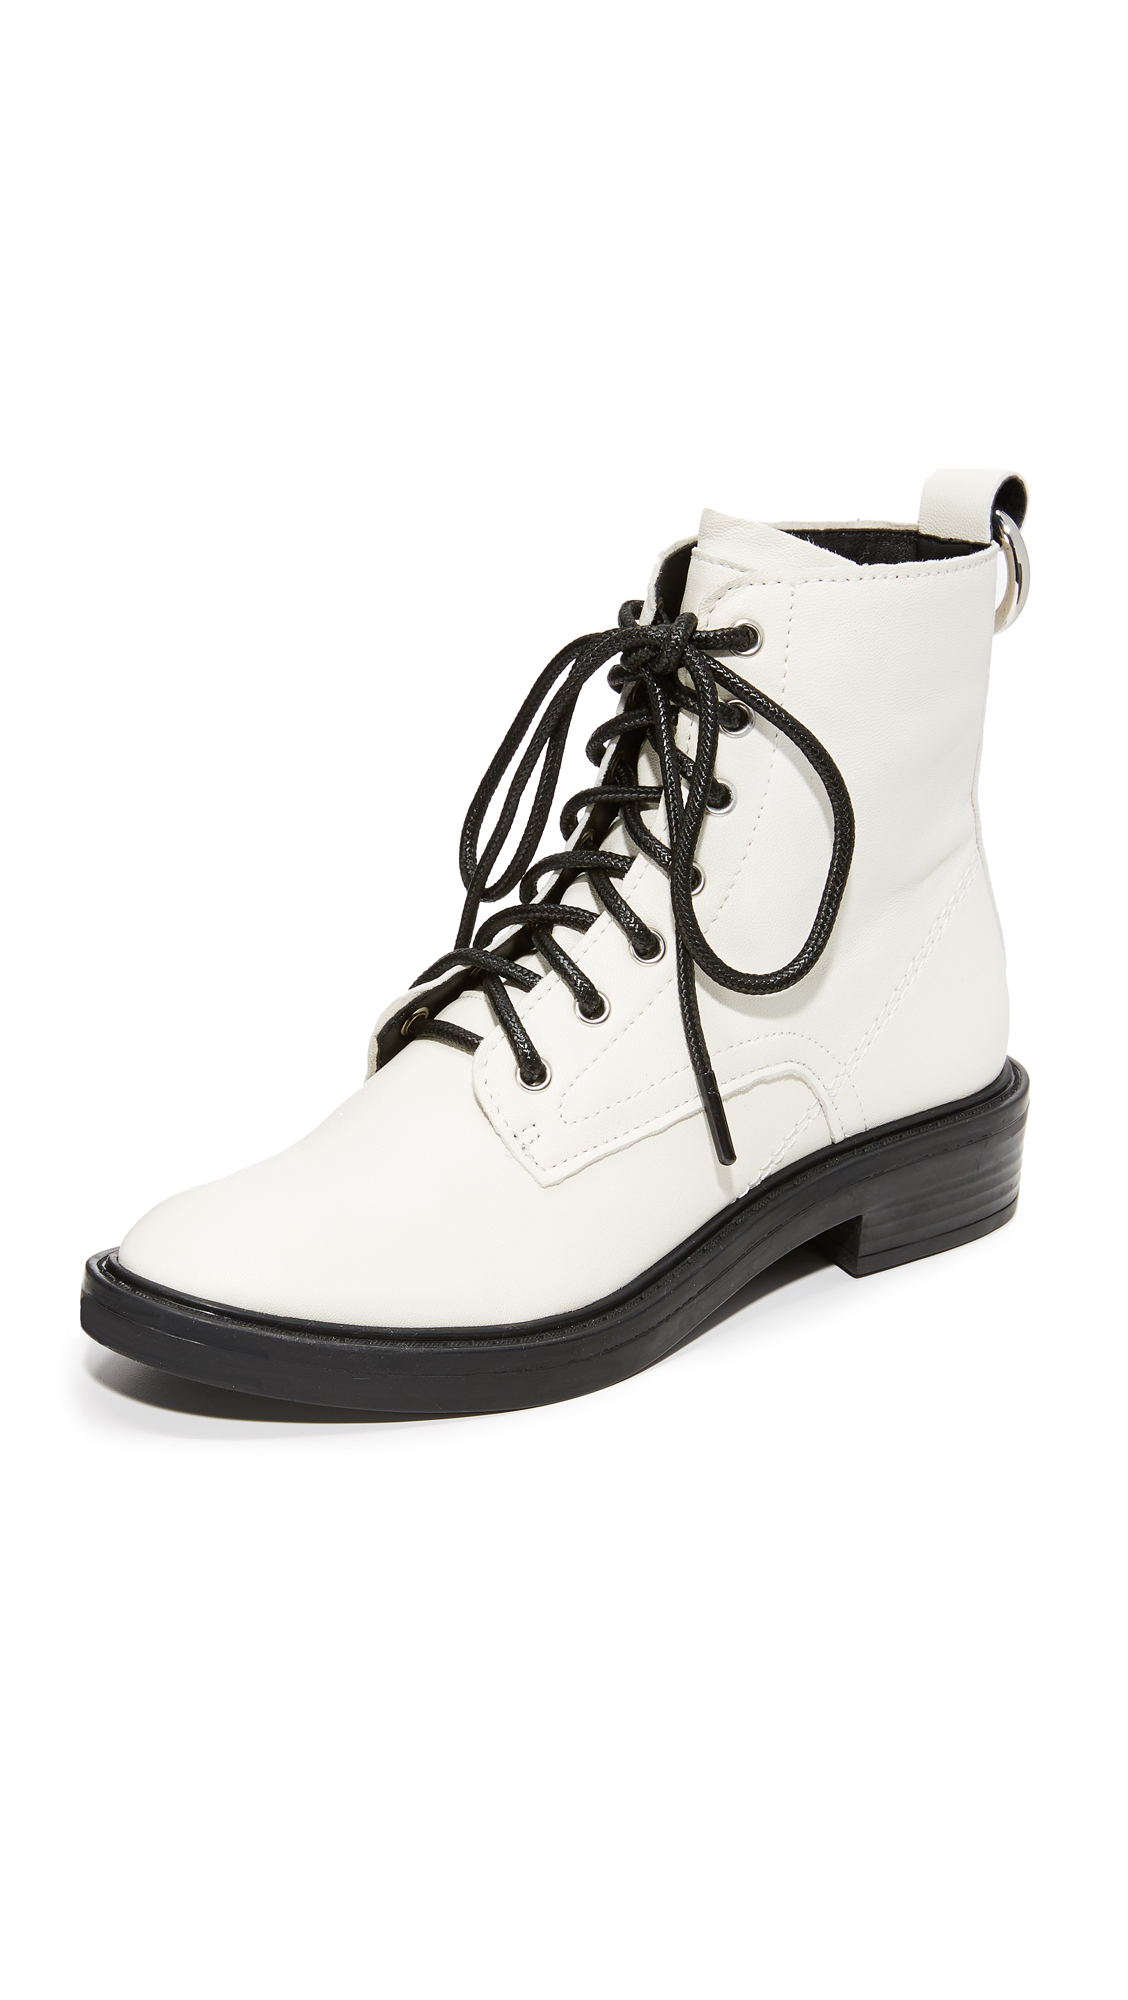 Dolce Vita Bardot Combat Boots - Off White